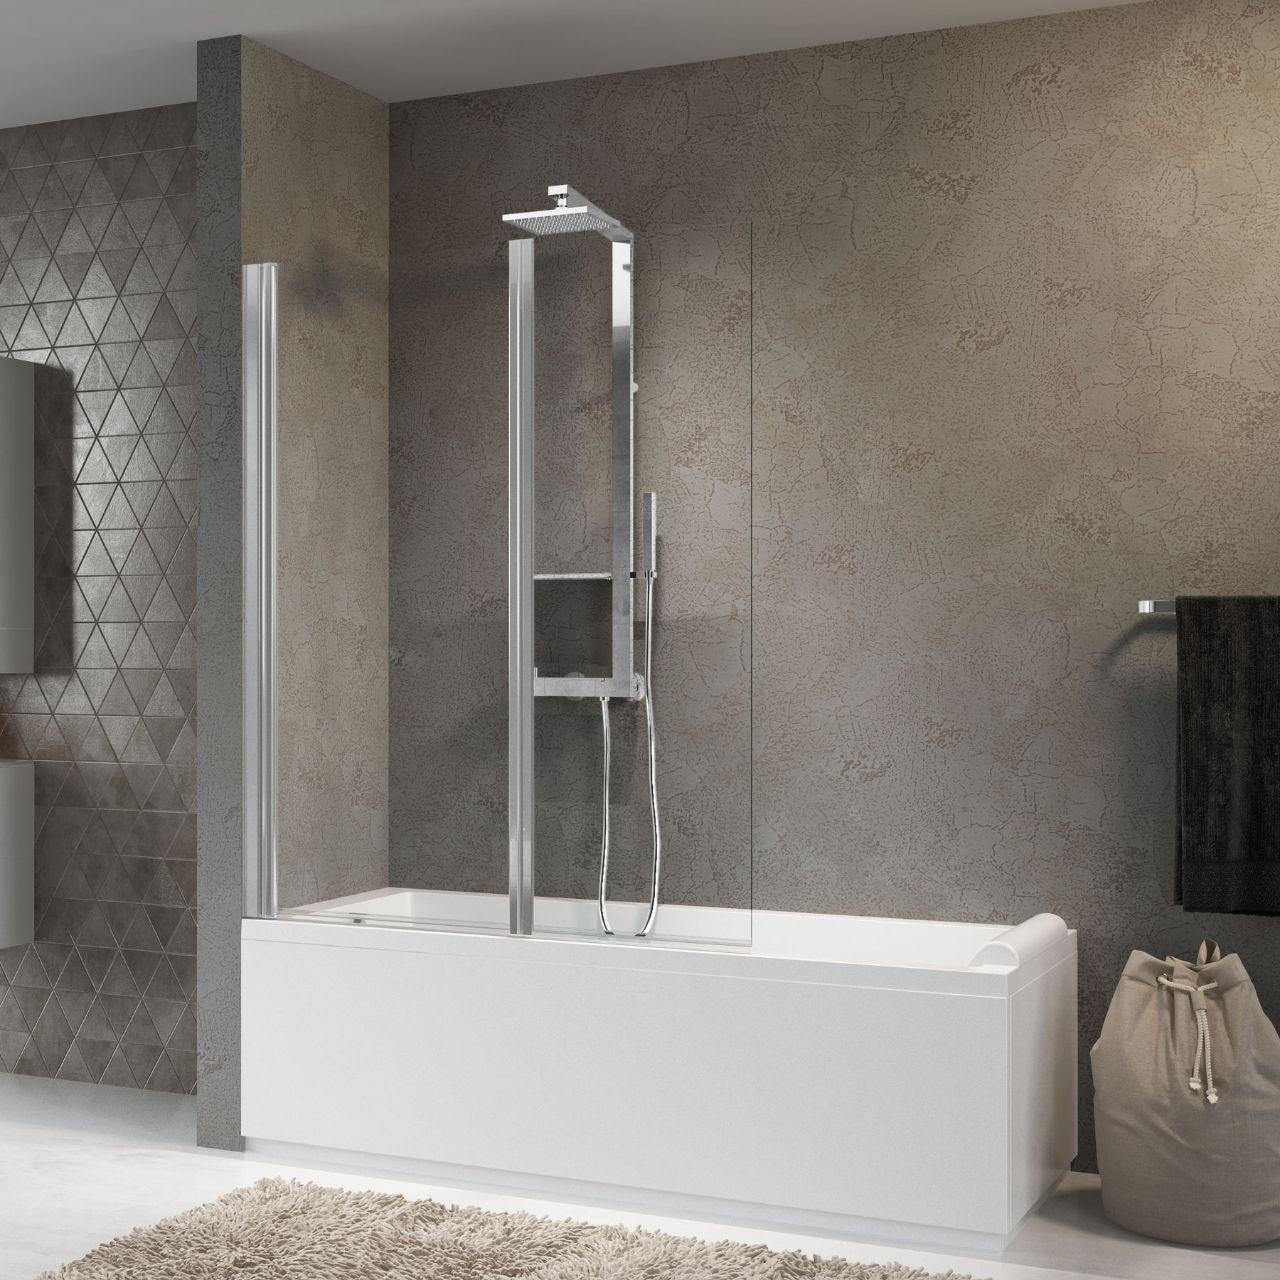 pare baignoires aurora 2 novellini. Black Bedroom Furniture Sets. Home Design Ideas